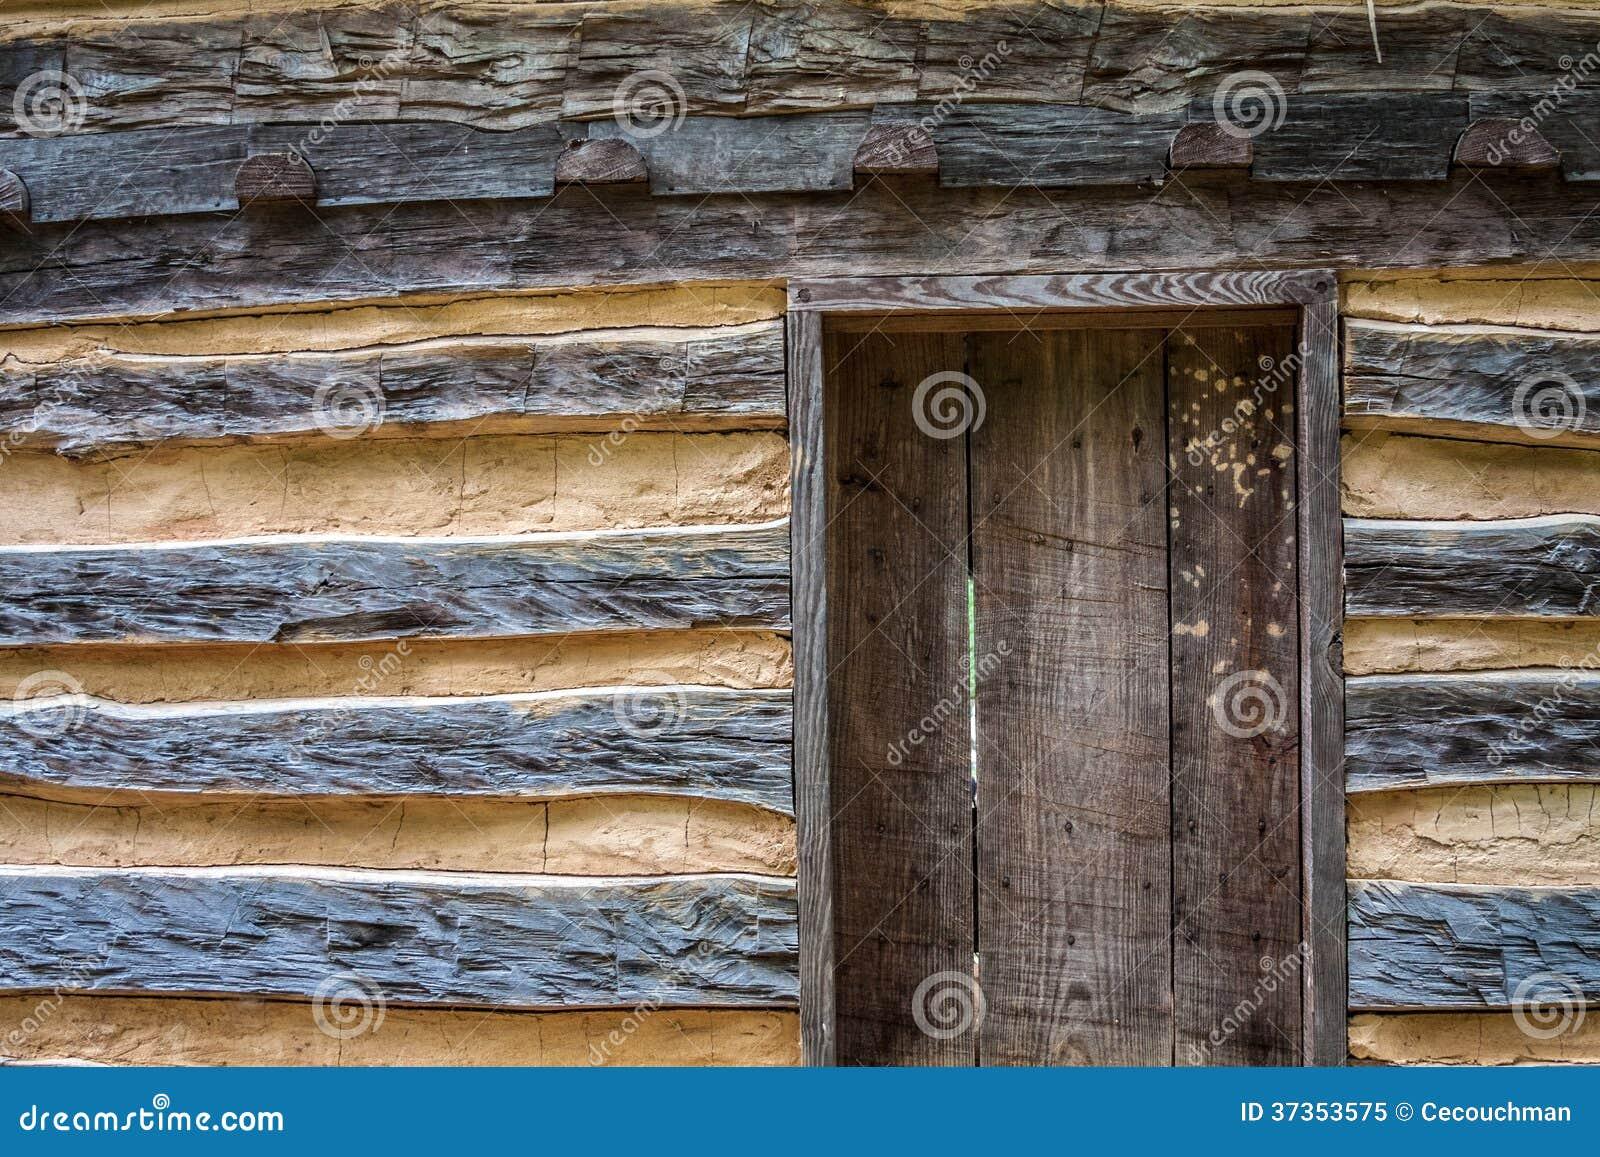 Rustic Log Cabin With Door Stock Image Image Of Cabin